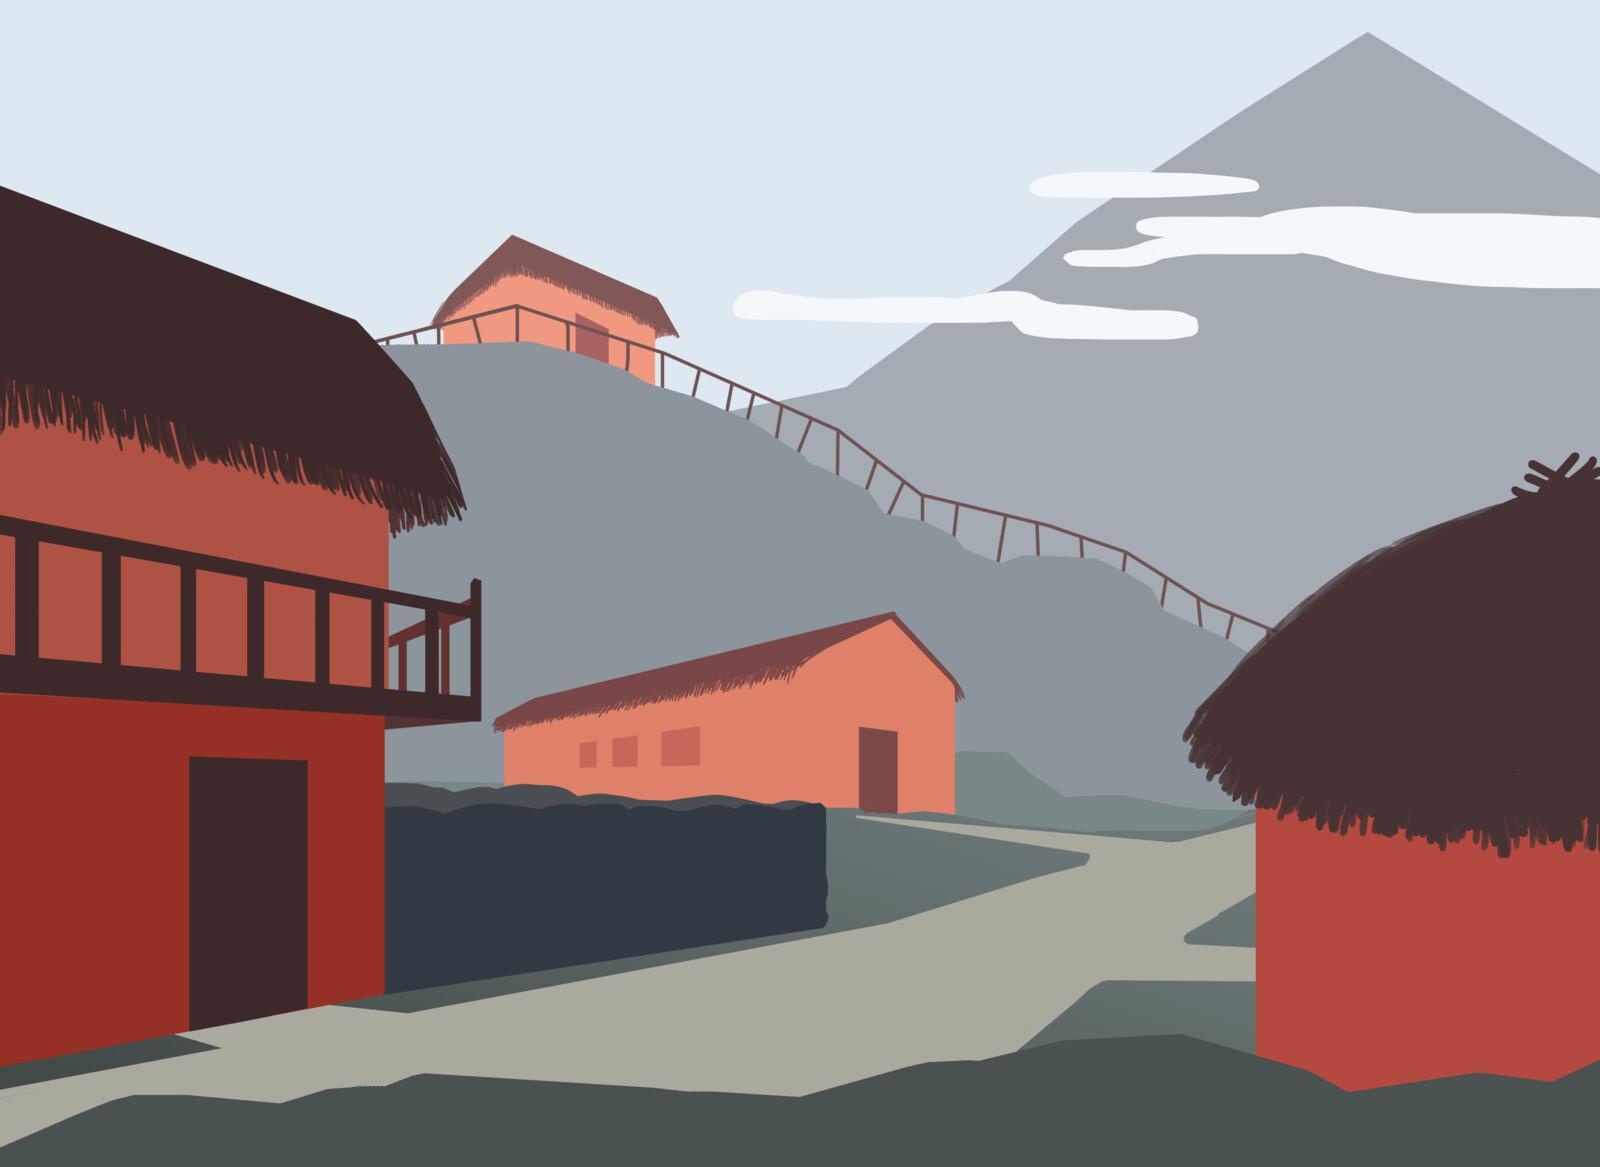 Village (process)